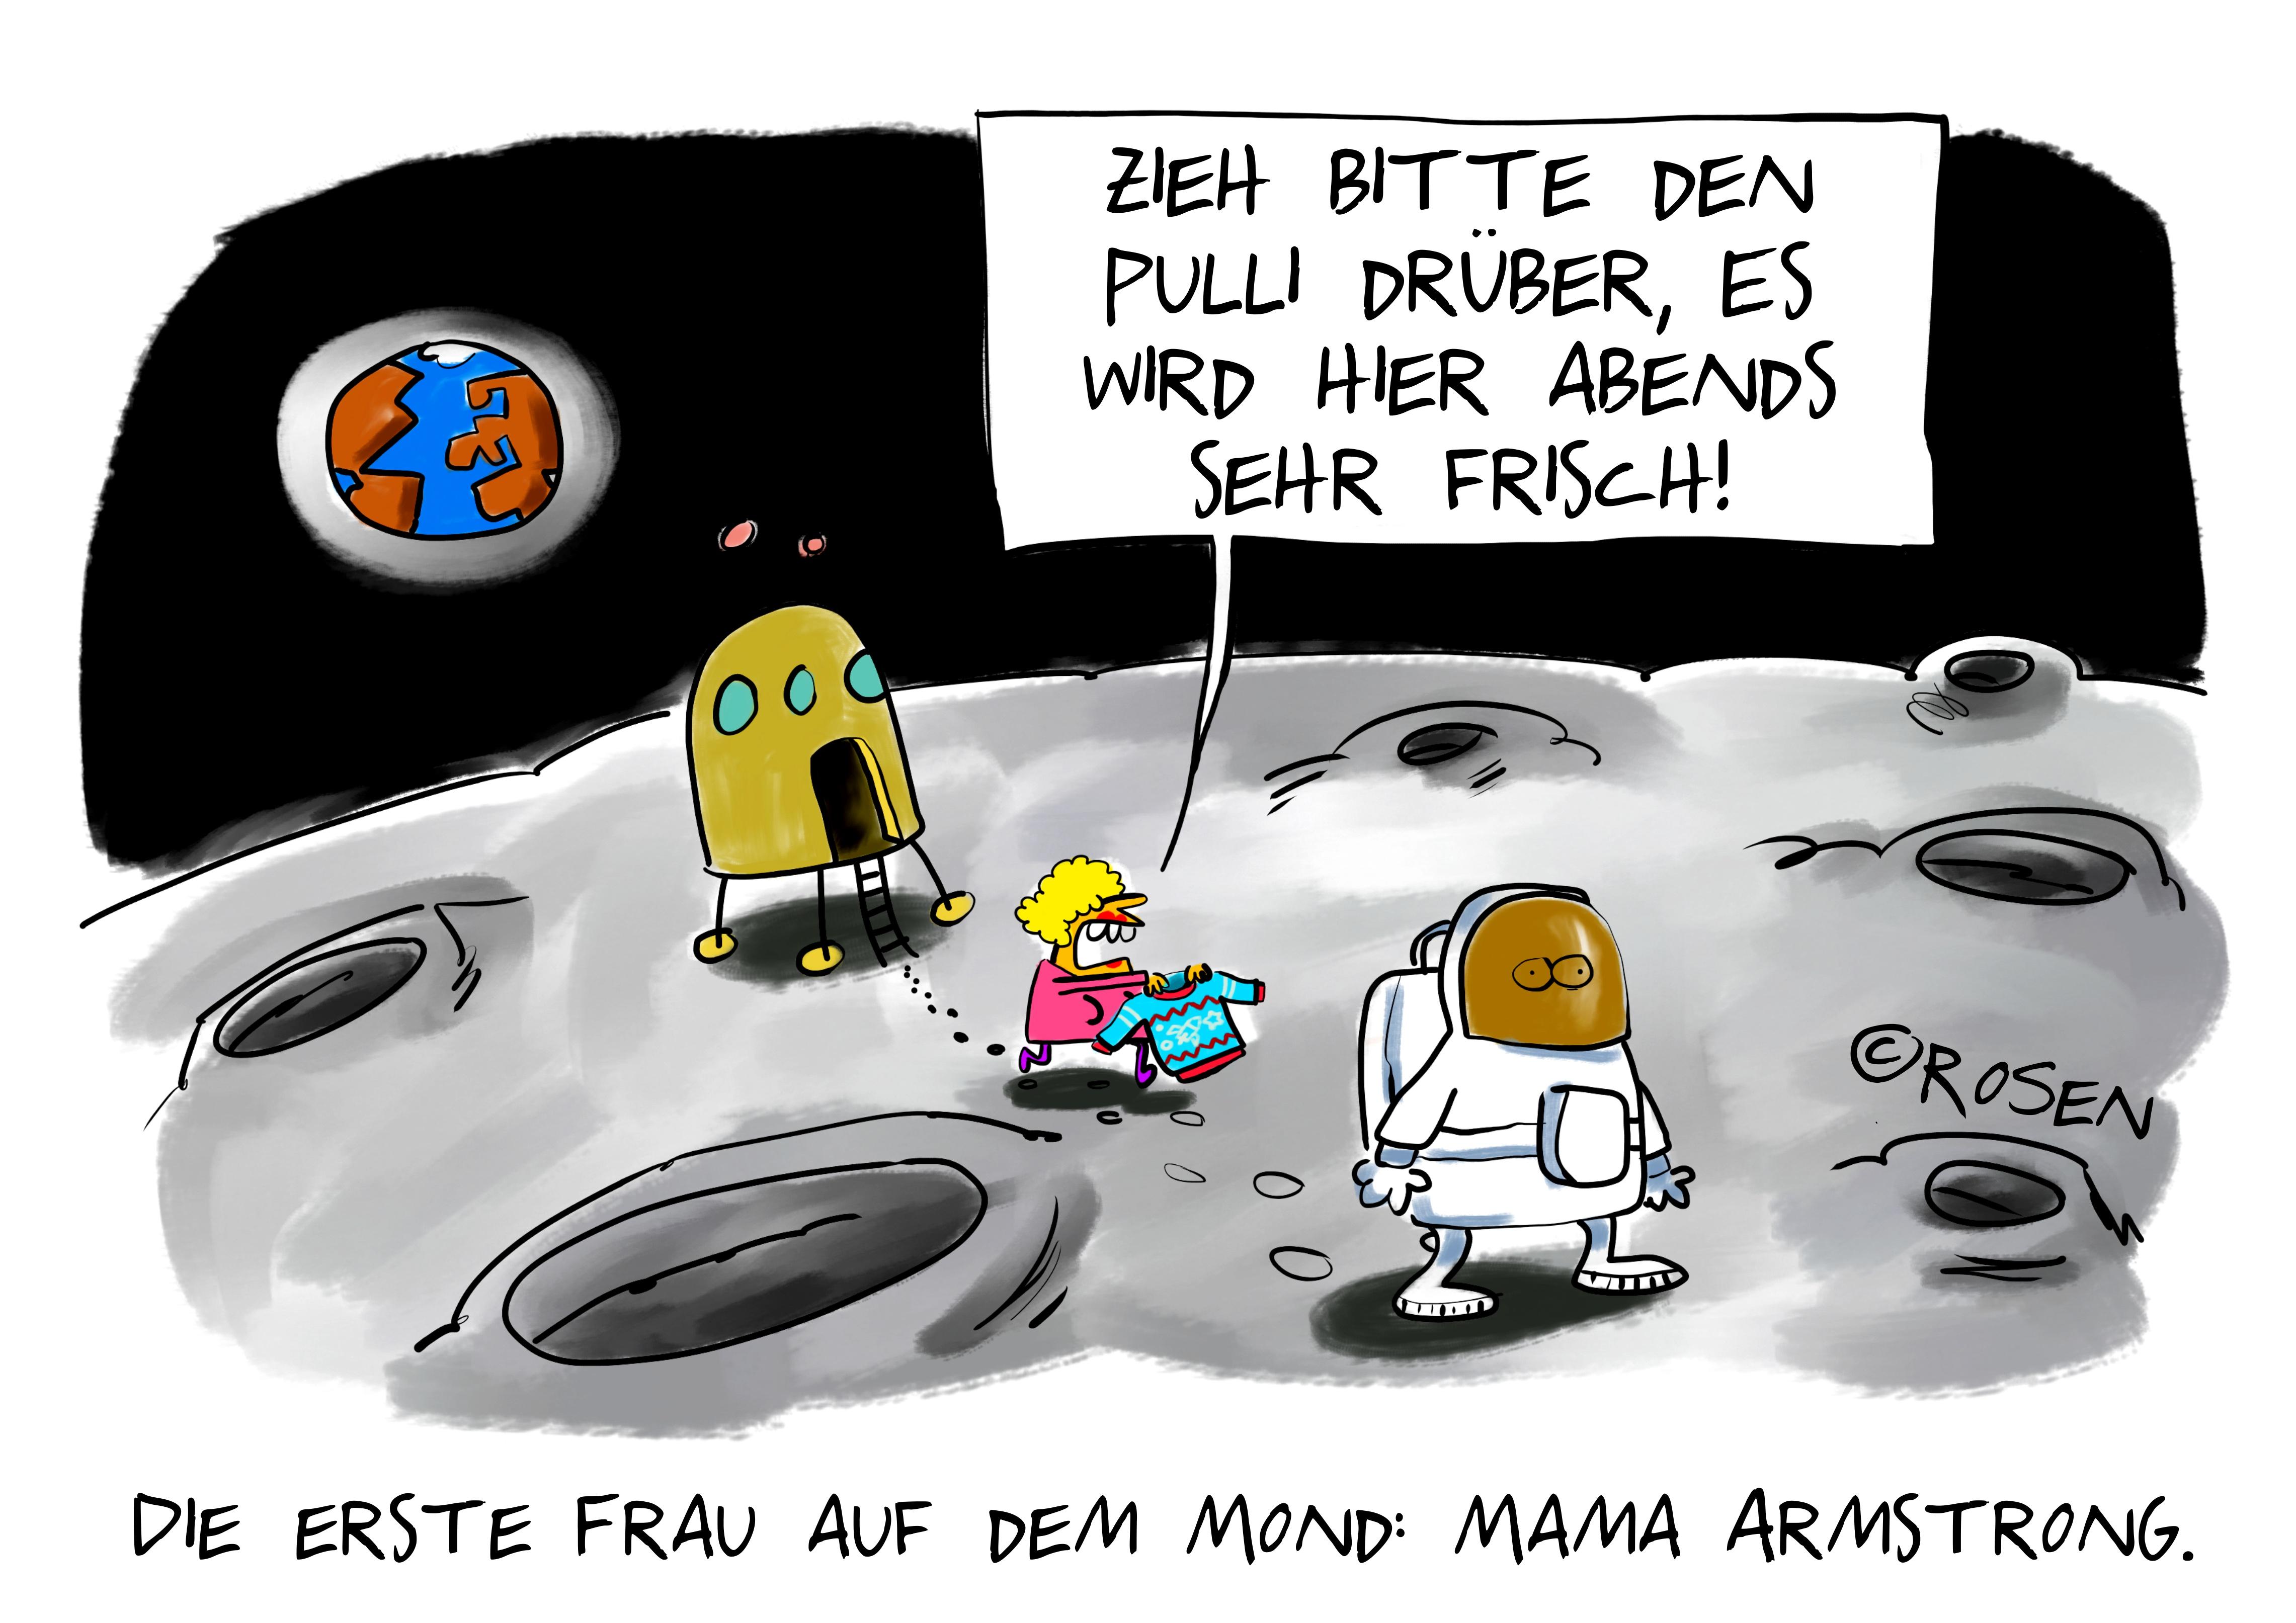 Frau auf dem Mond